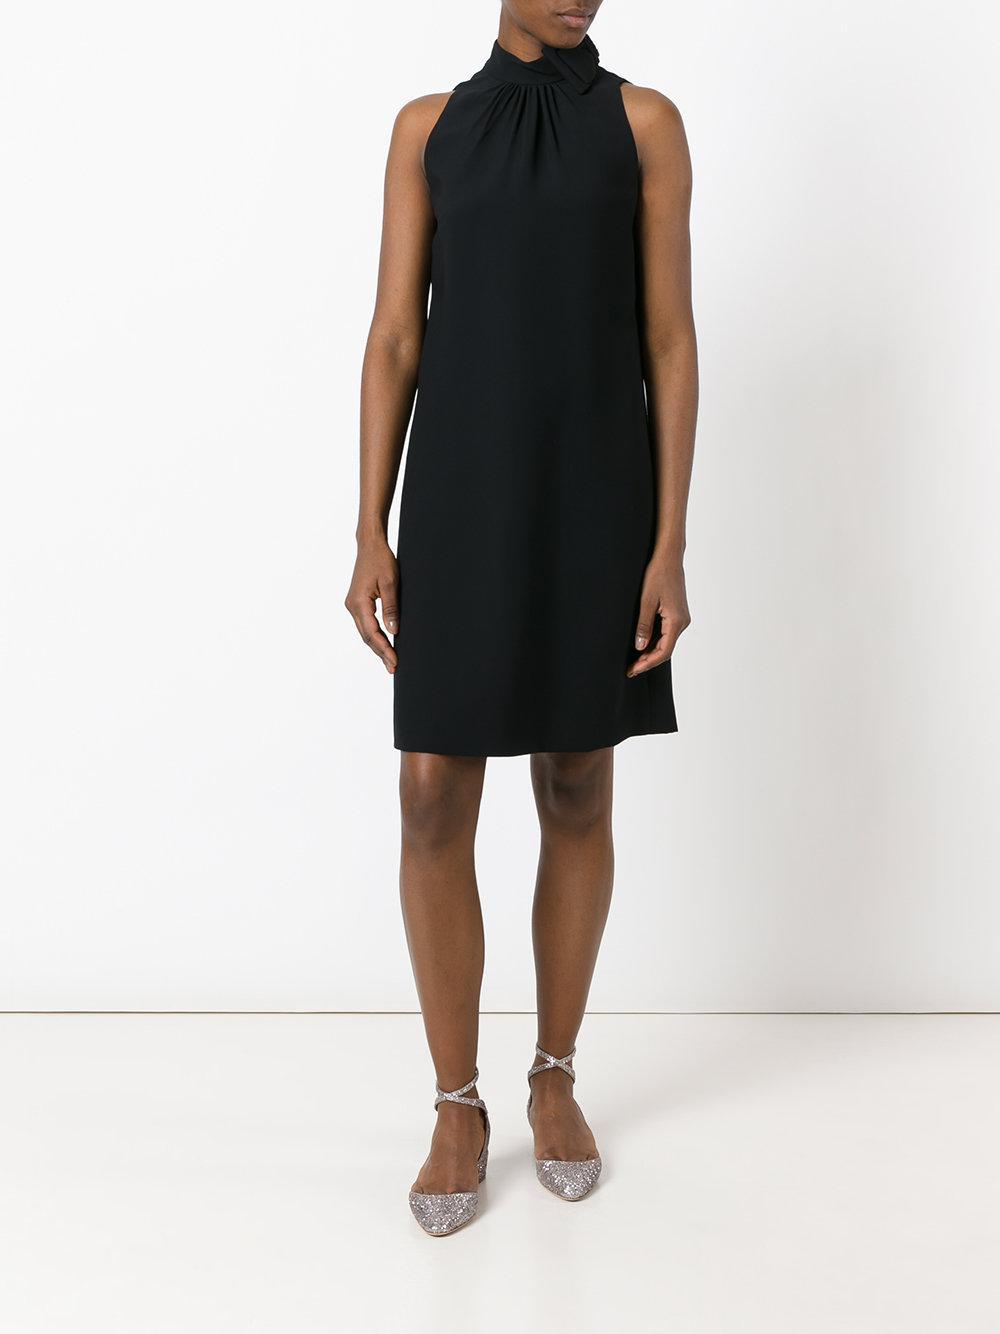 Prada Bow Neck Dress Women Silk Cupro Viscose 42